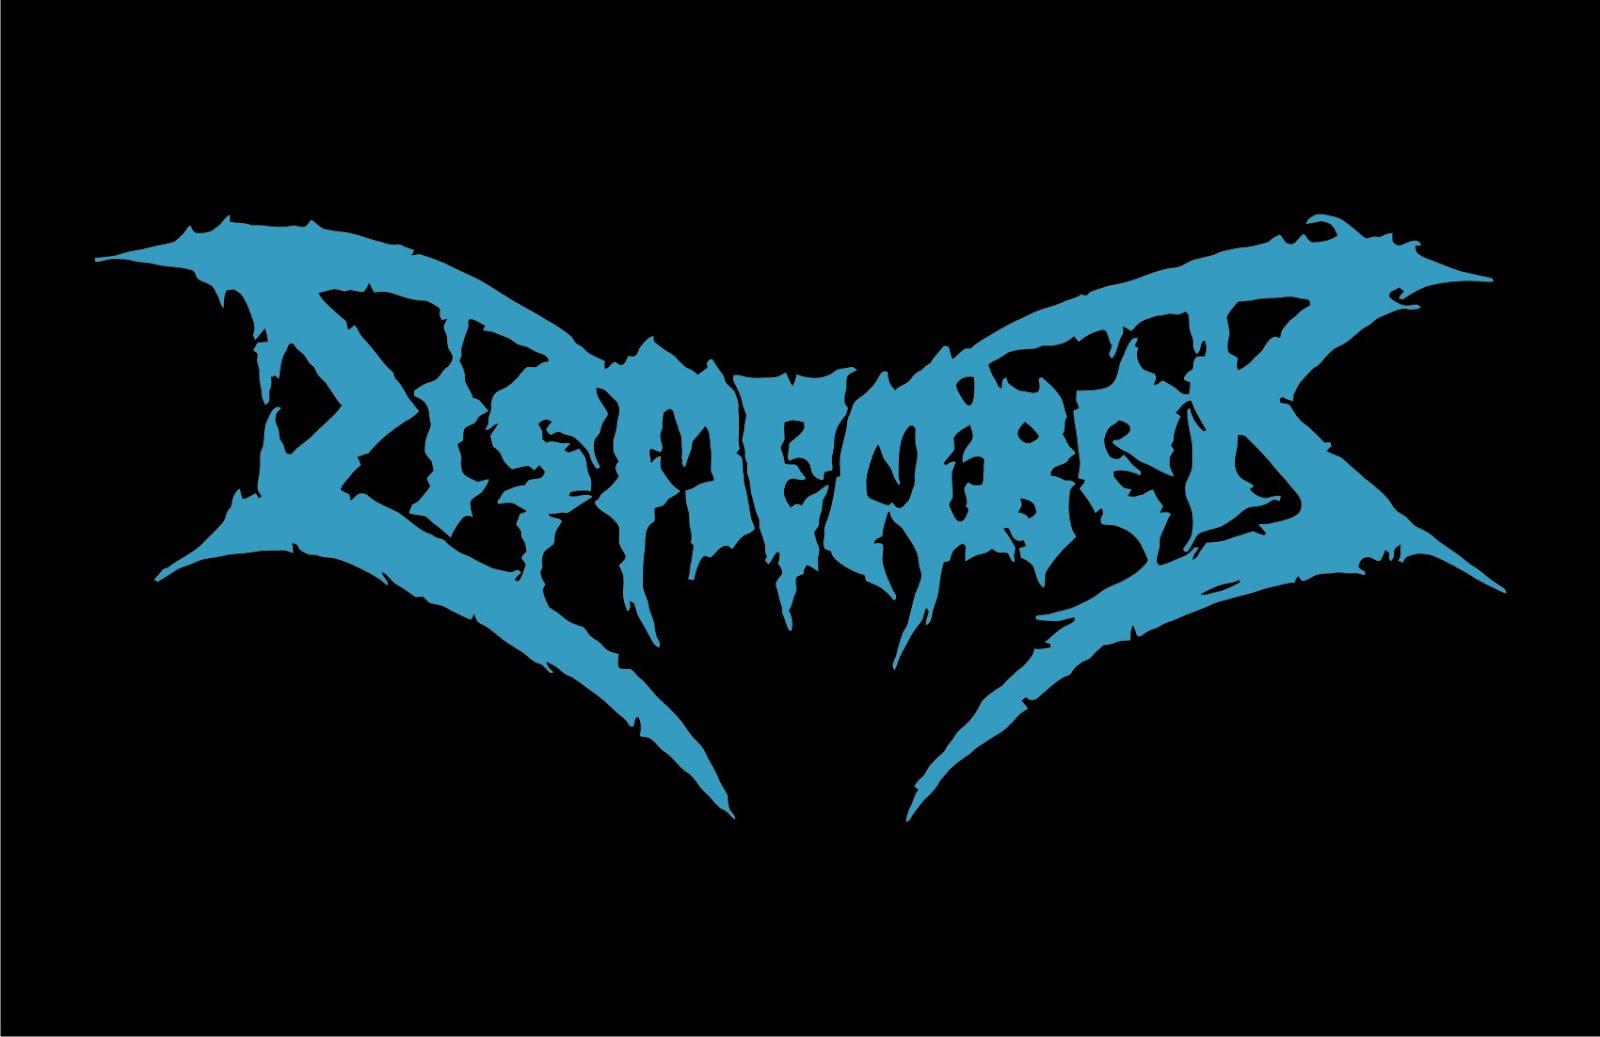 dismember-misanthropic_back_vector